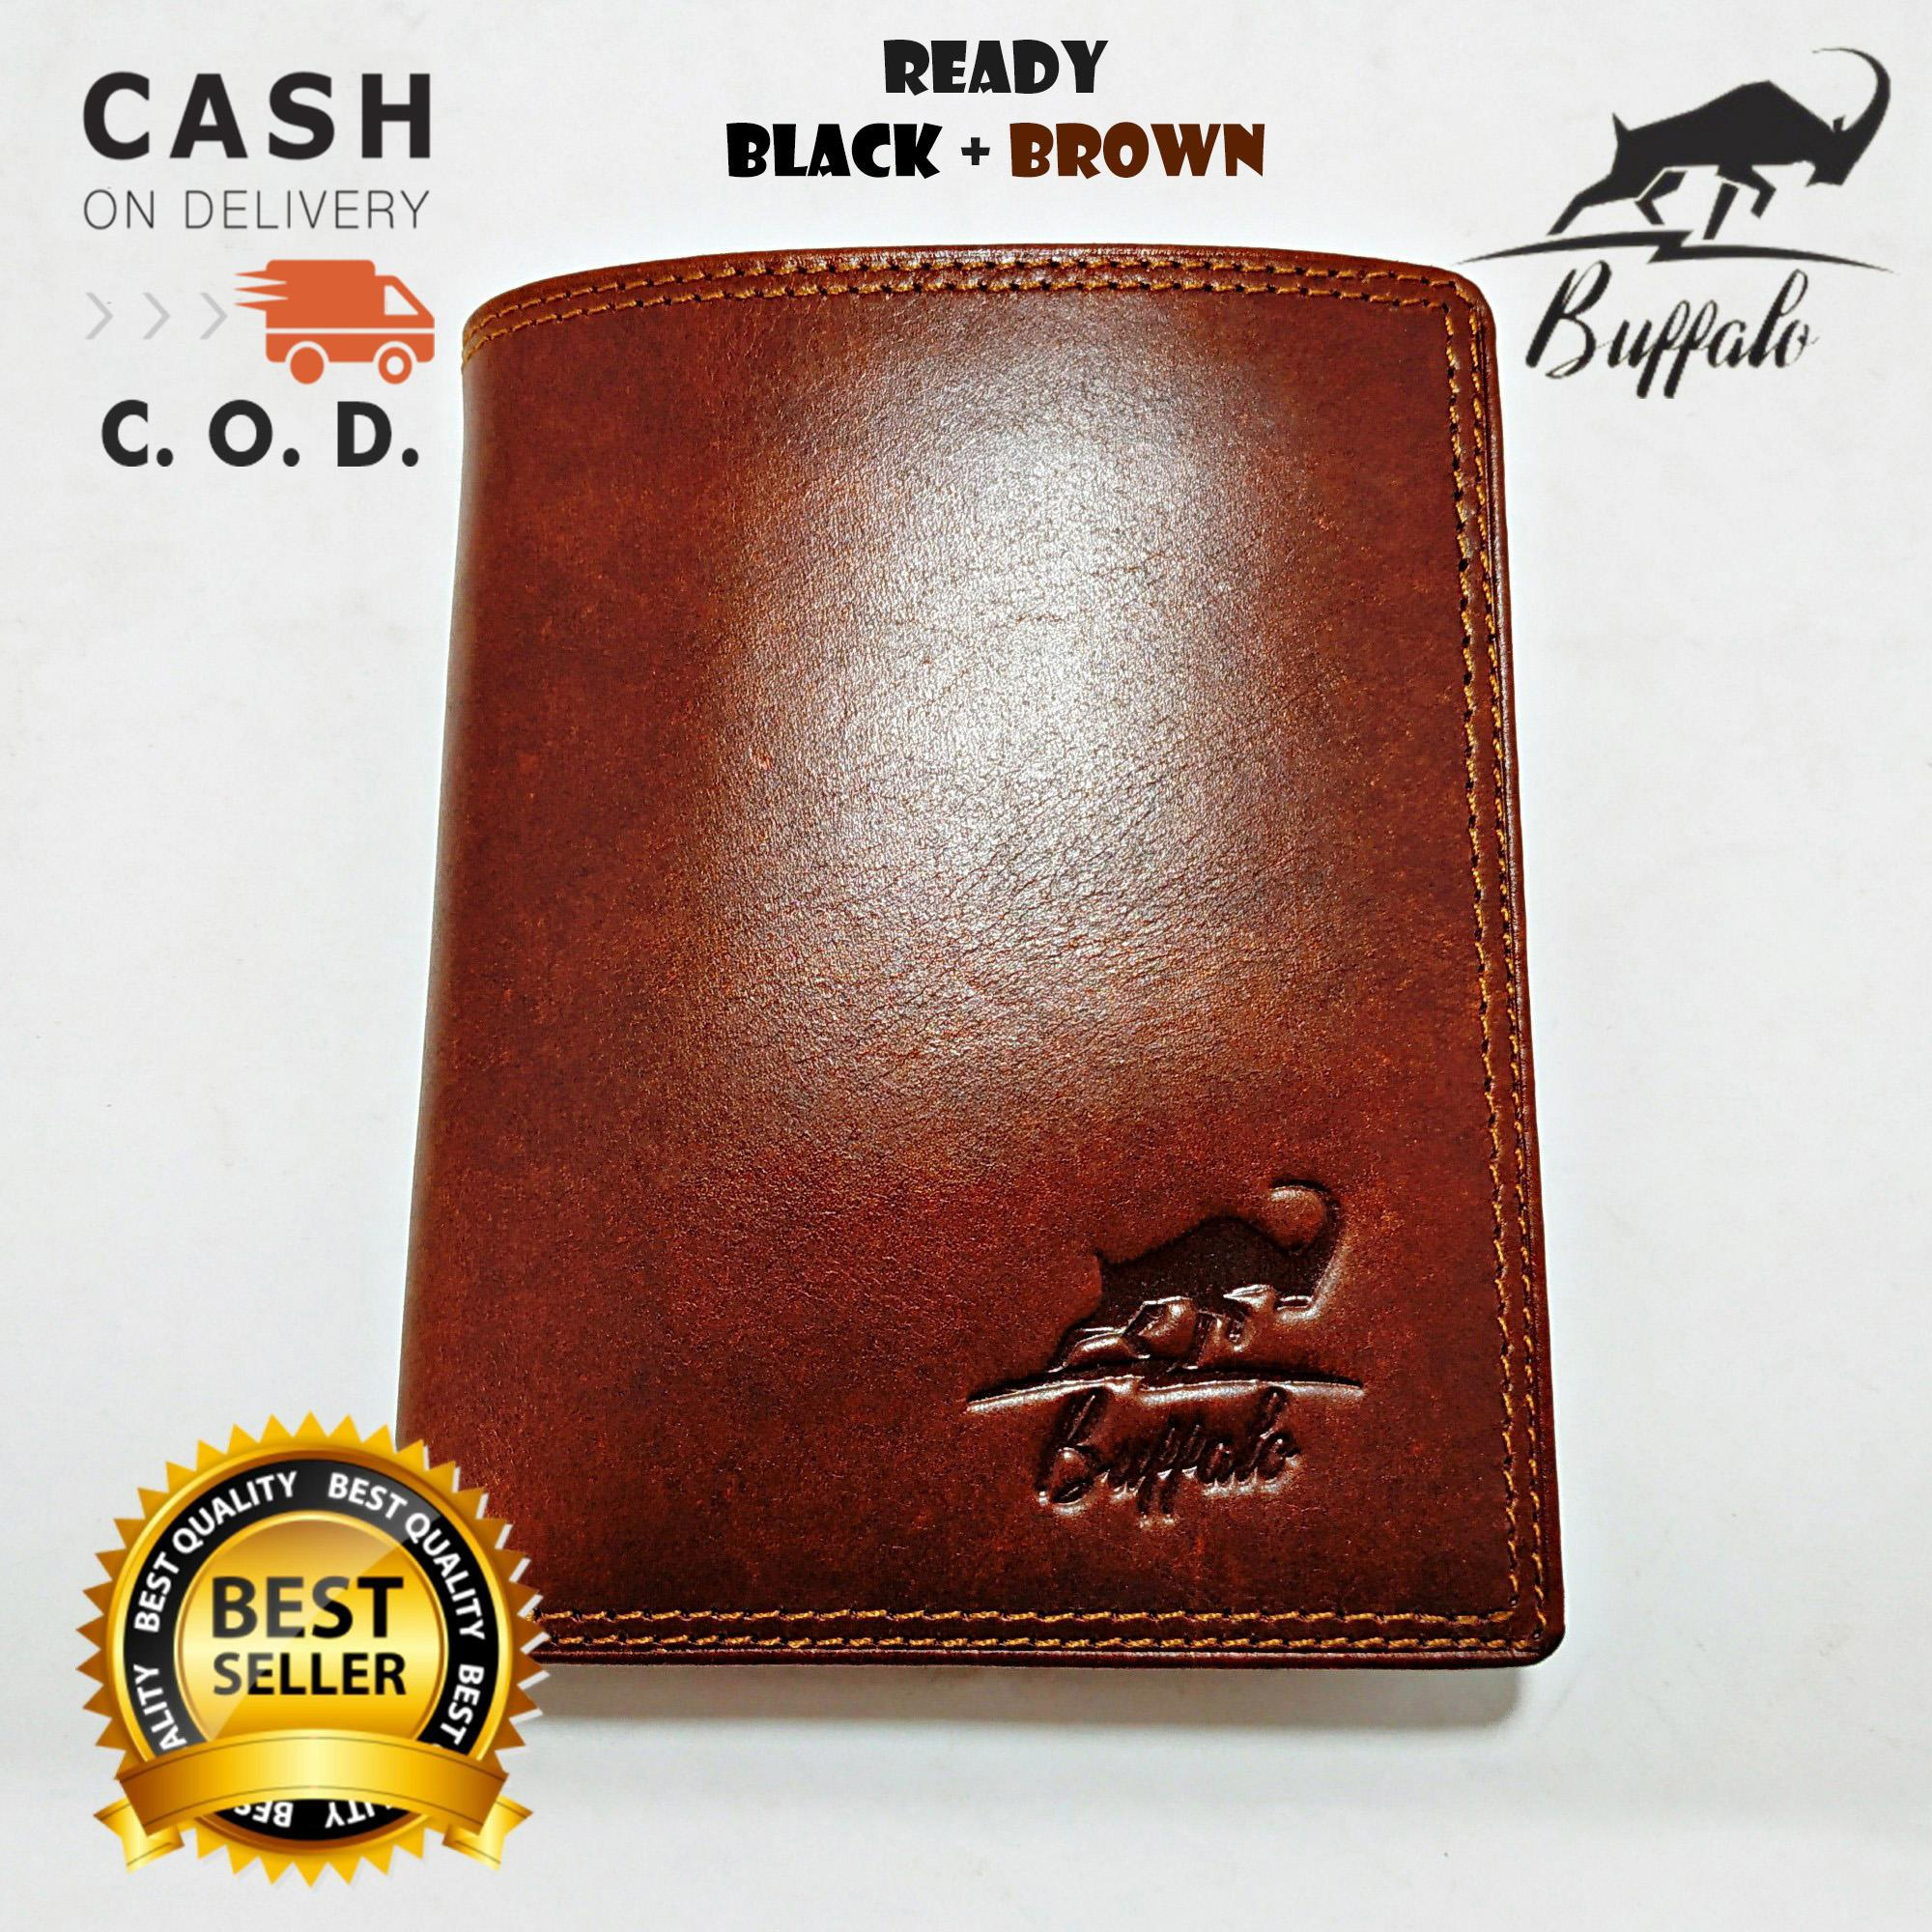 Buffalo Dompet Pria 100% Kulit Asli Model Lipat Dua atau 2 Double Casual Vintage Banyak